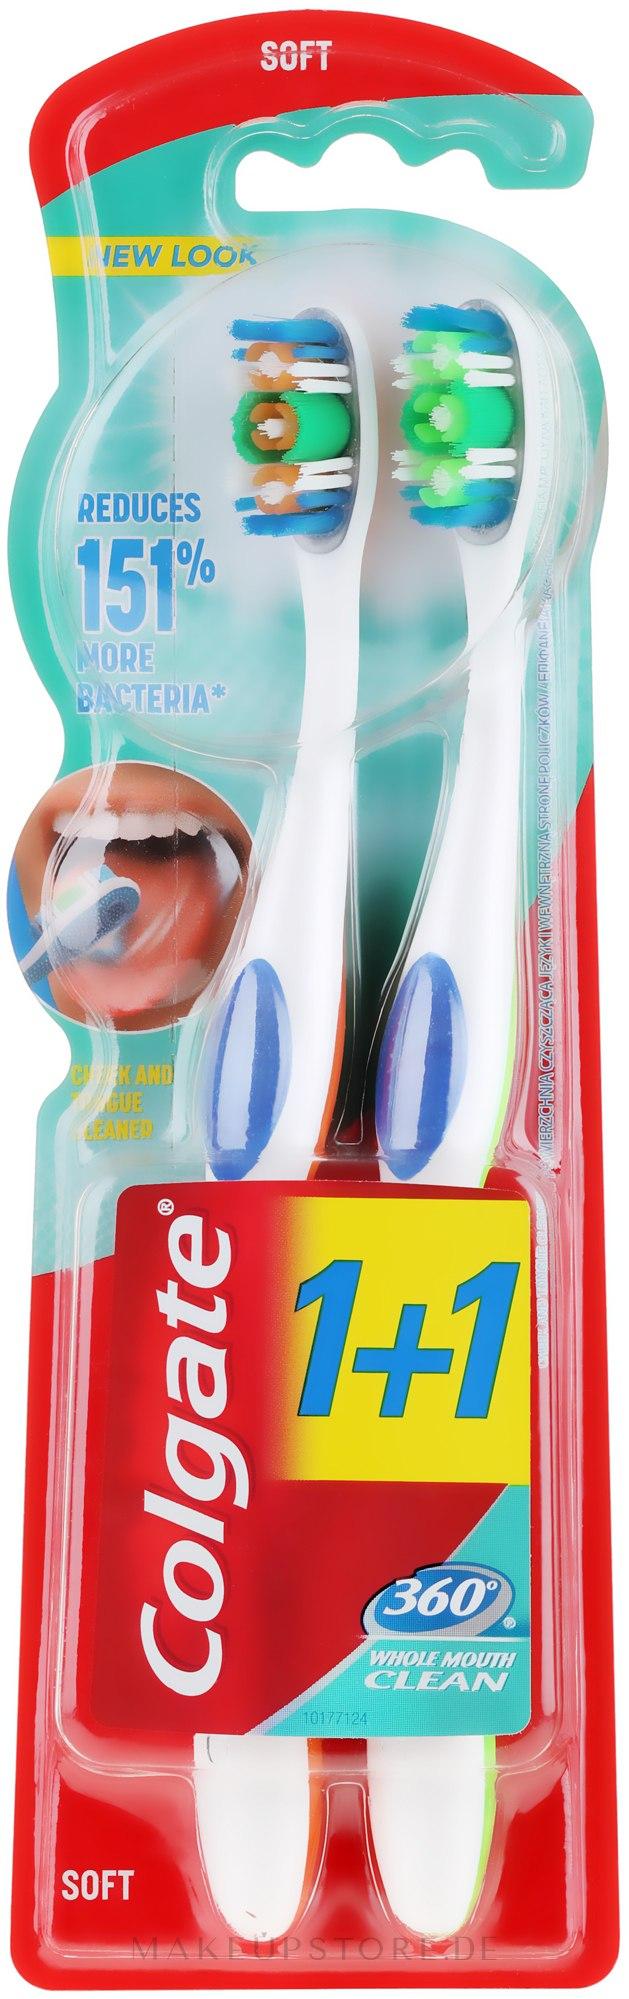 Zahnbürste weich 360° Whole Mouth Clean orange, grün 2 St. - Colgate 360 Whole Mouth Clean Soft — Bild 2 St..